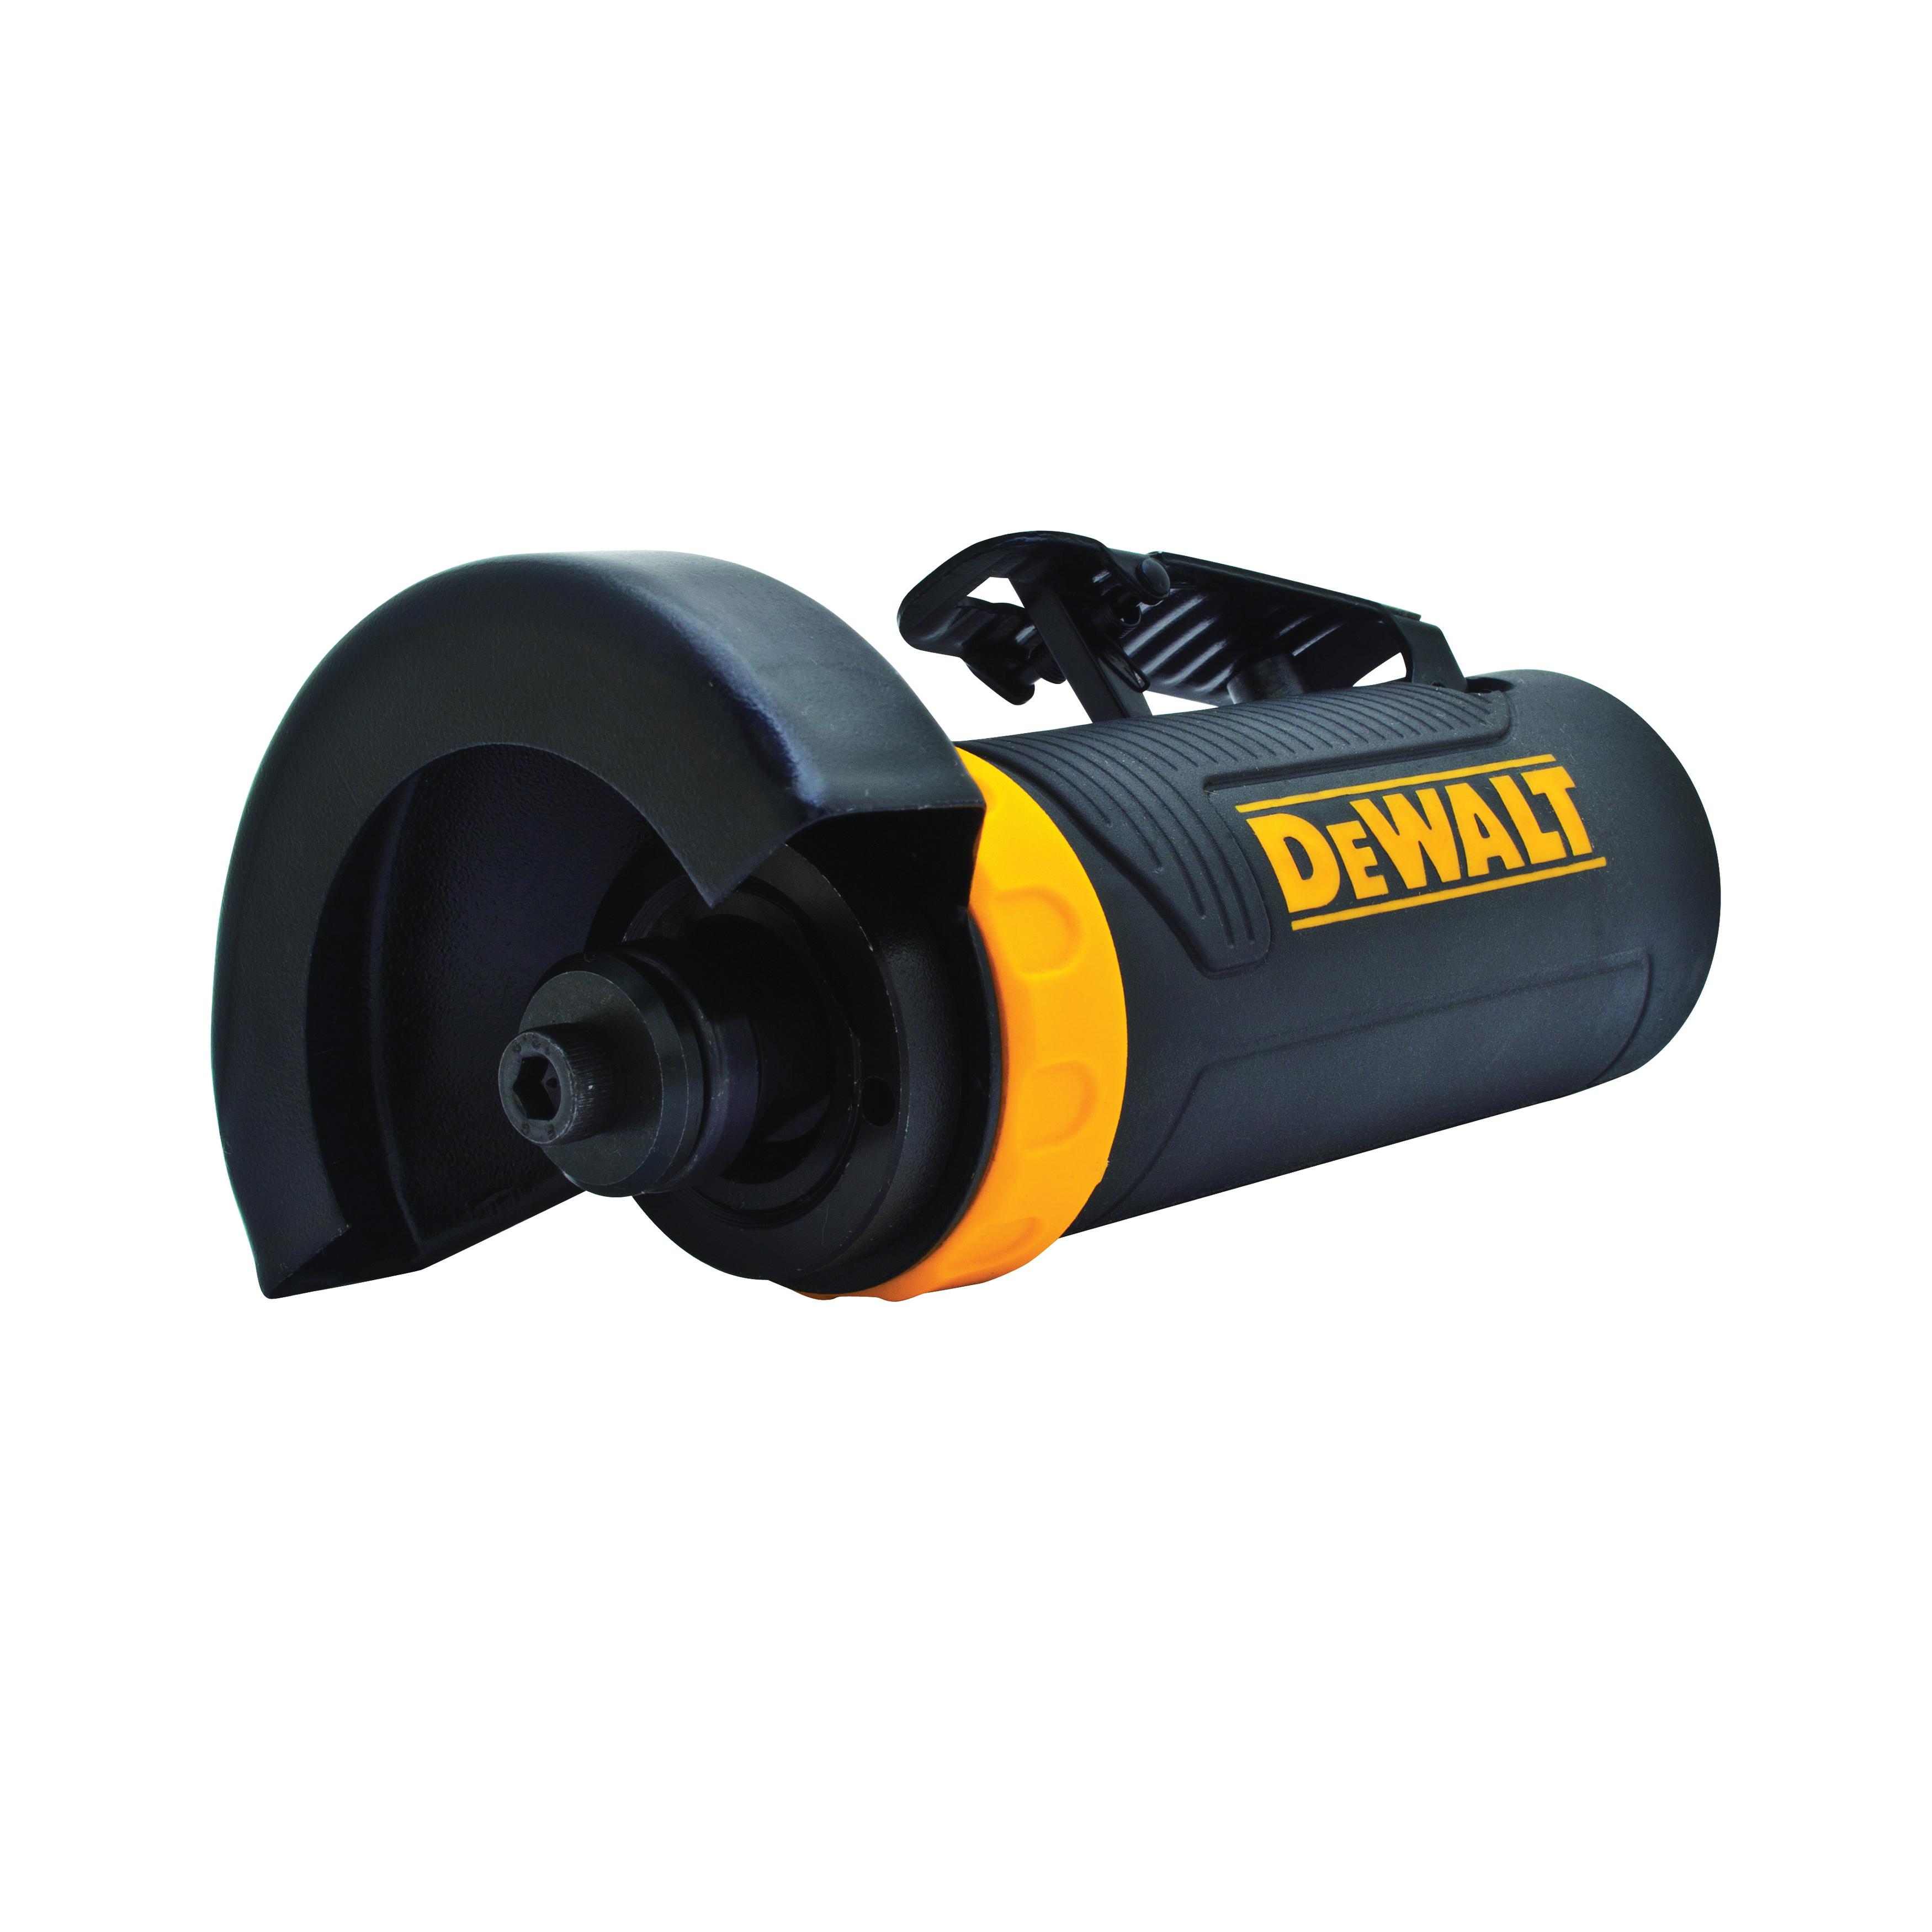 DeWALT® DWMT70784 Pneumatic Cut-Off Tool, 3 in Dia Wheel, 19000 rpm Speed, 4.4 cfm Air Flow, 90 psi, Tool Only